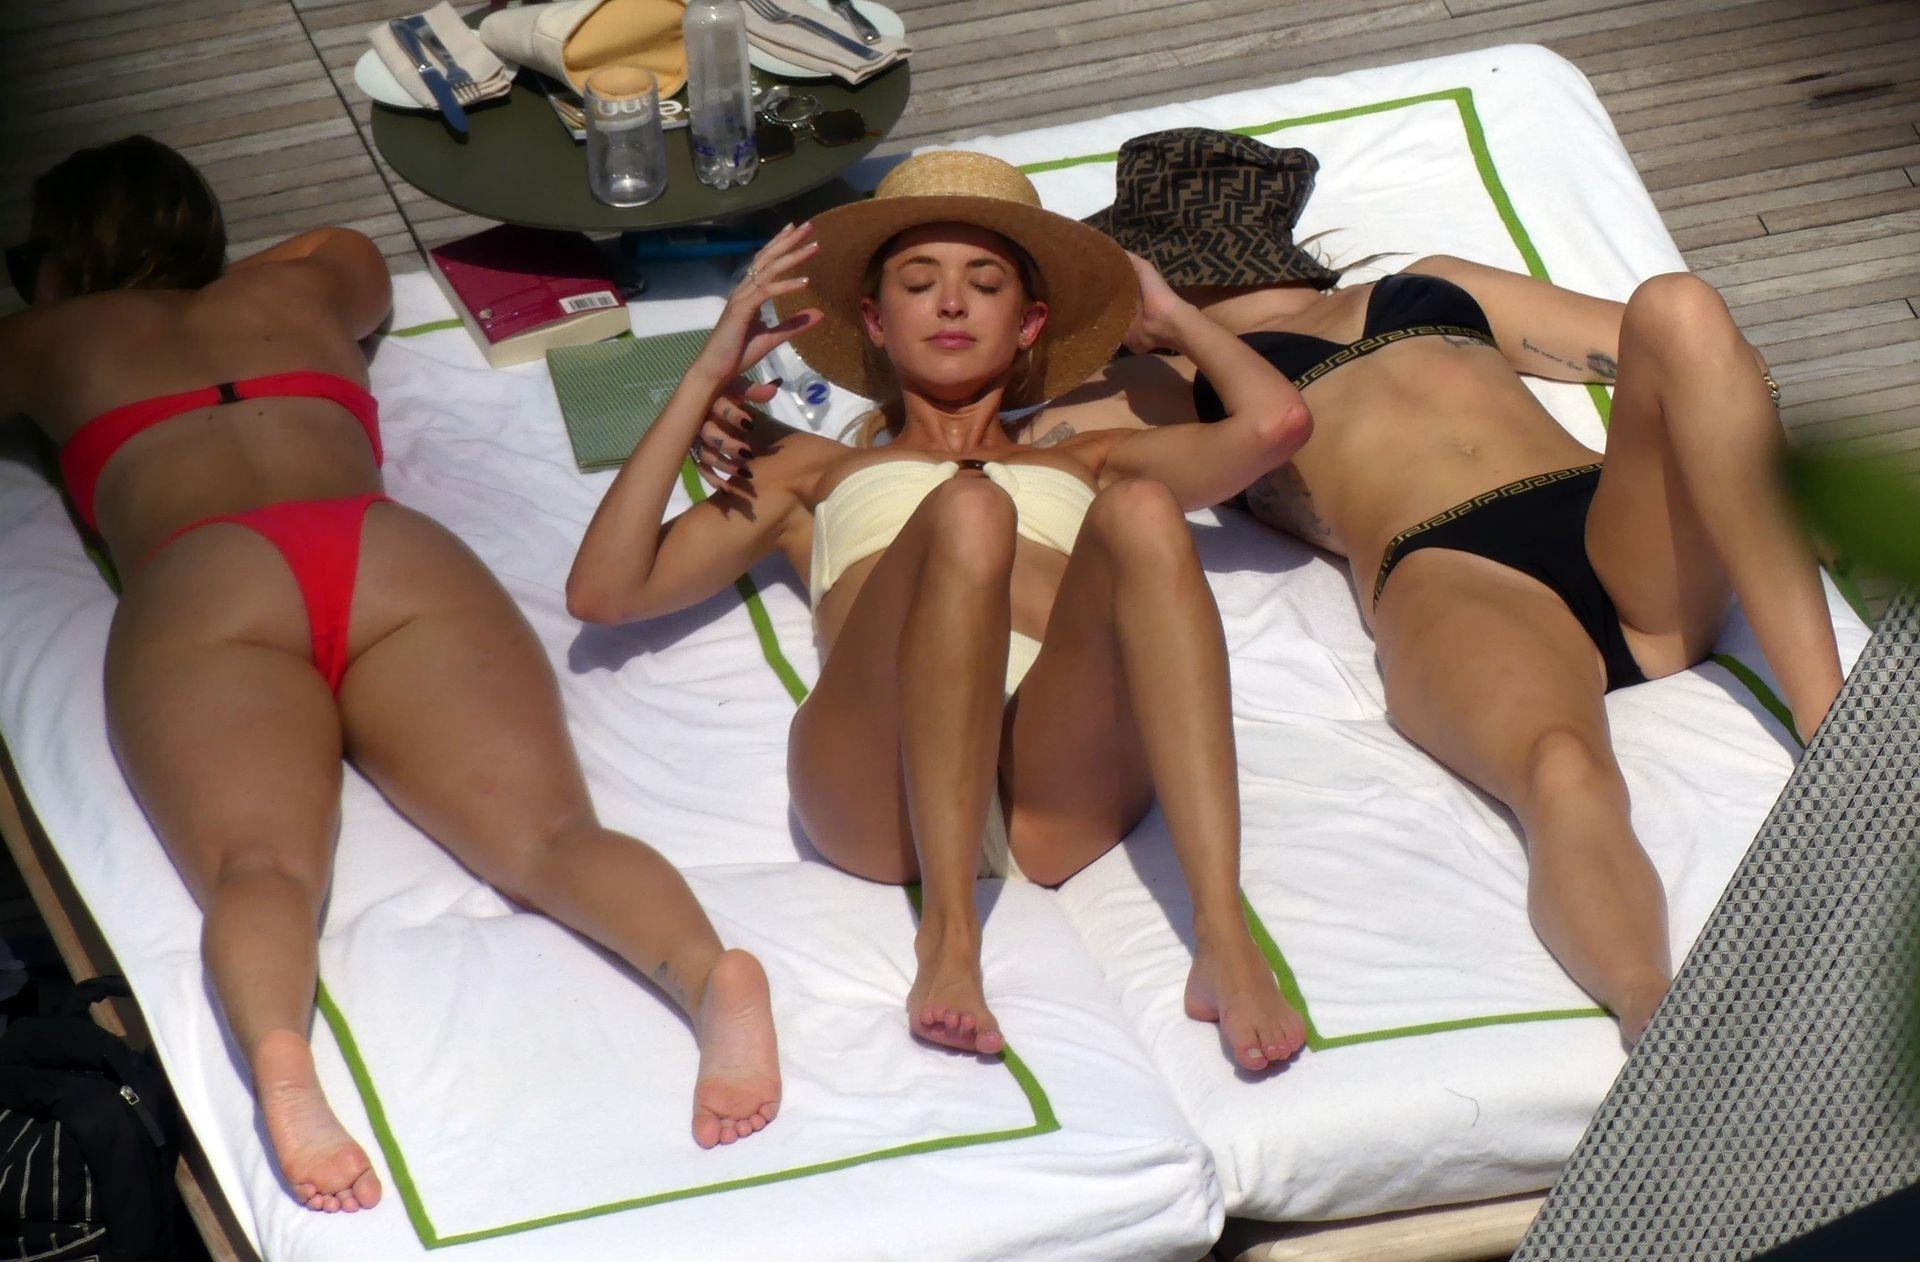 0713004446900_32_Miley-Cyrus-Topless-Kaitlynn-Carter-Hot-TheFappeningBlog.com-32.jpg